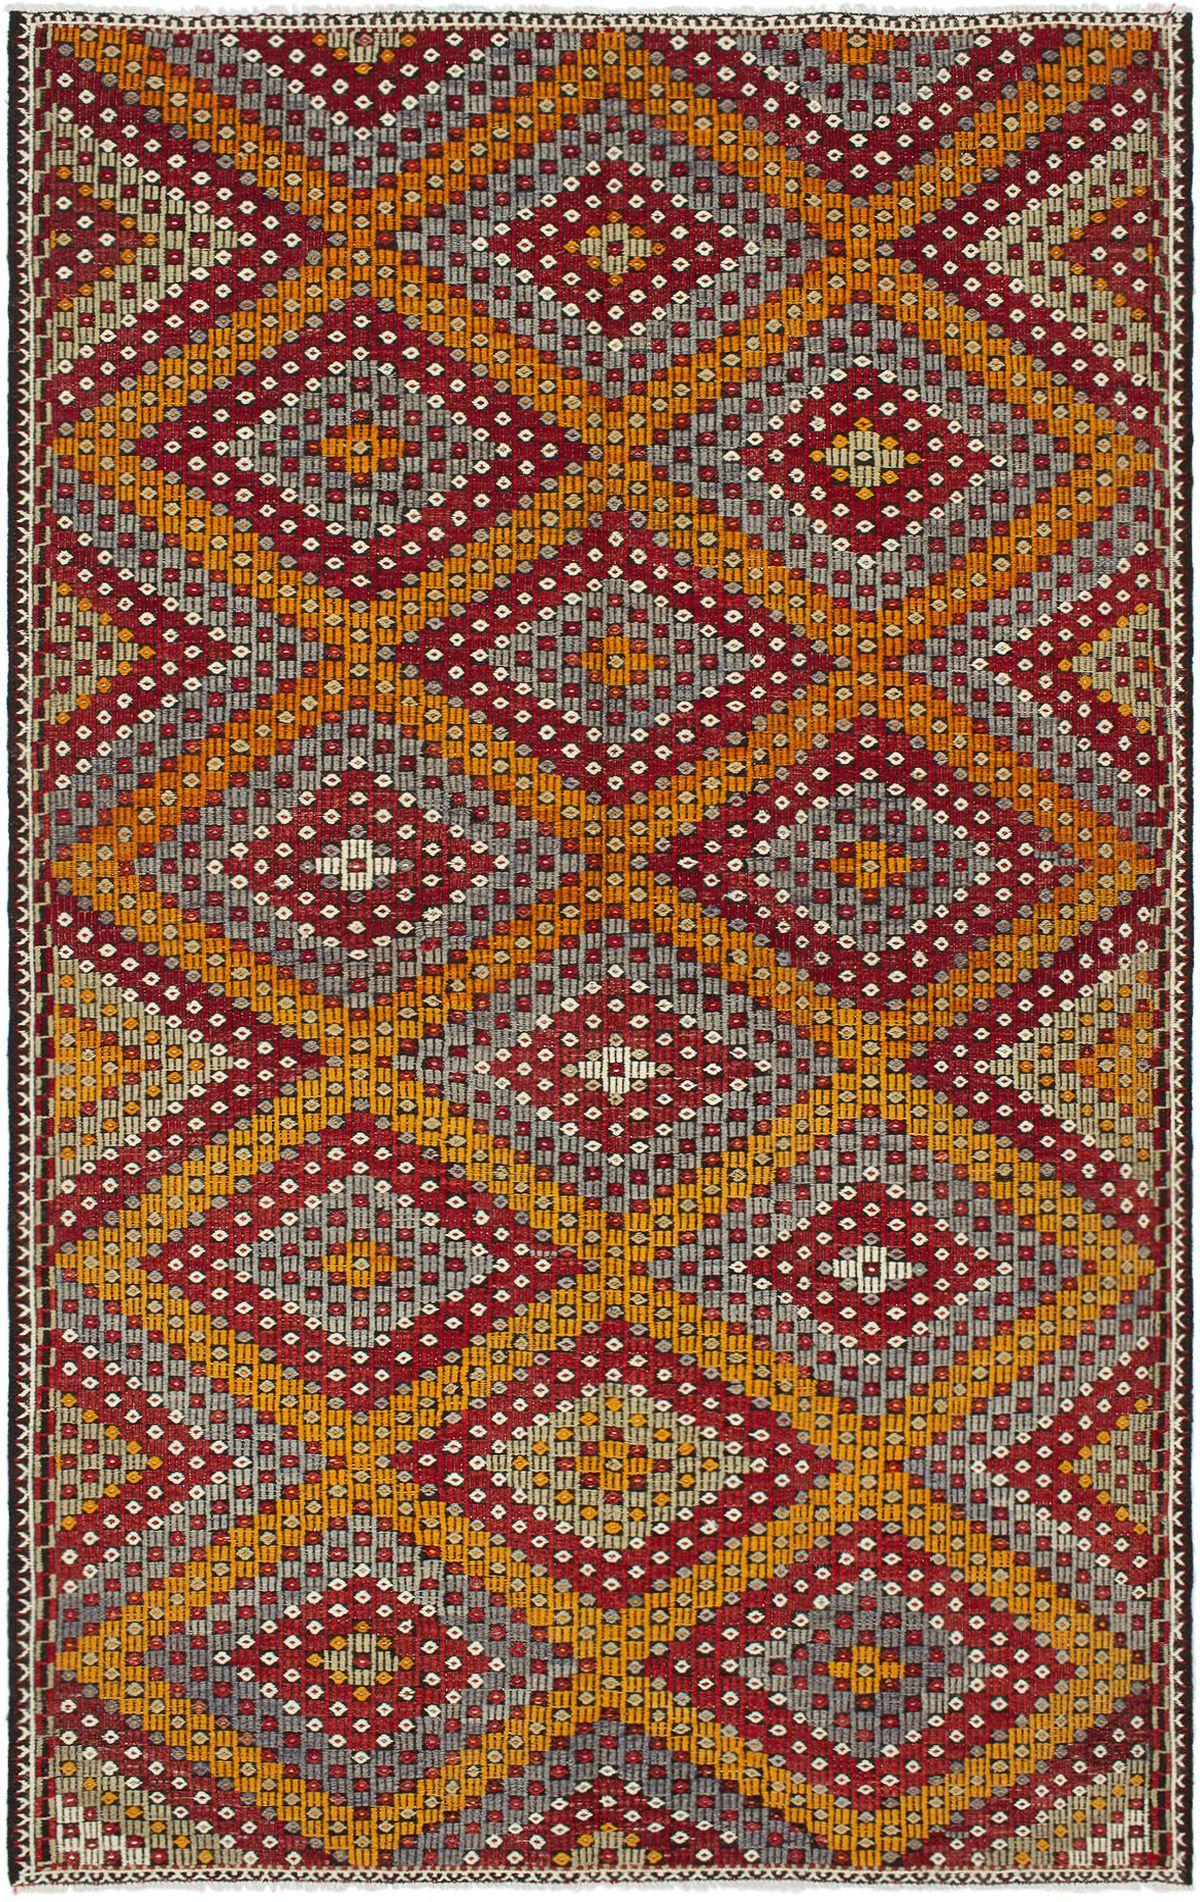 "Hand woven Yoruk Dark Red, Orange Wool Tapestry Kilim 6'4"" x 10'2"" Size: 6'4"" x 10'2"""